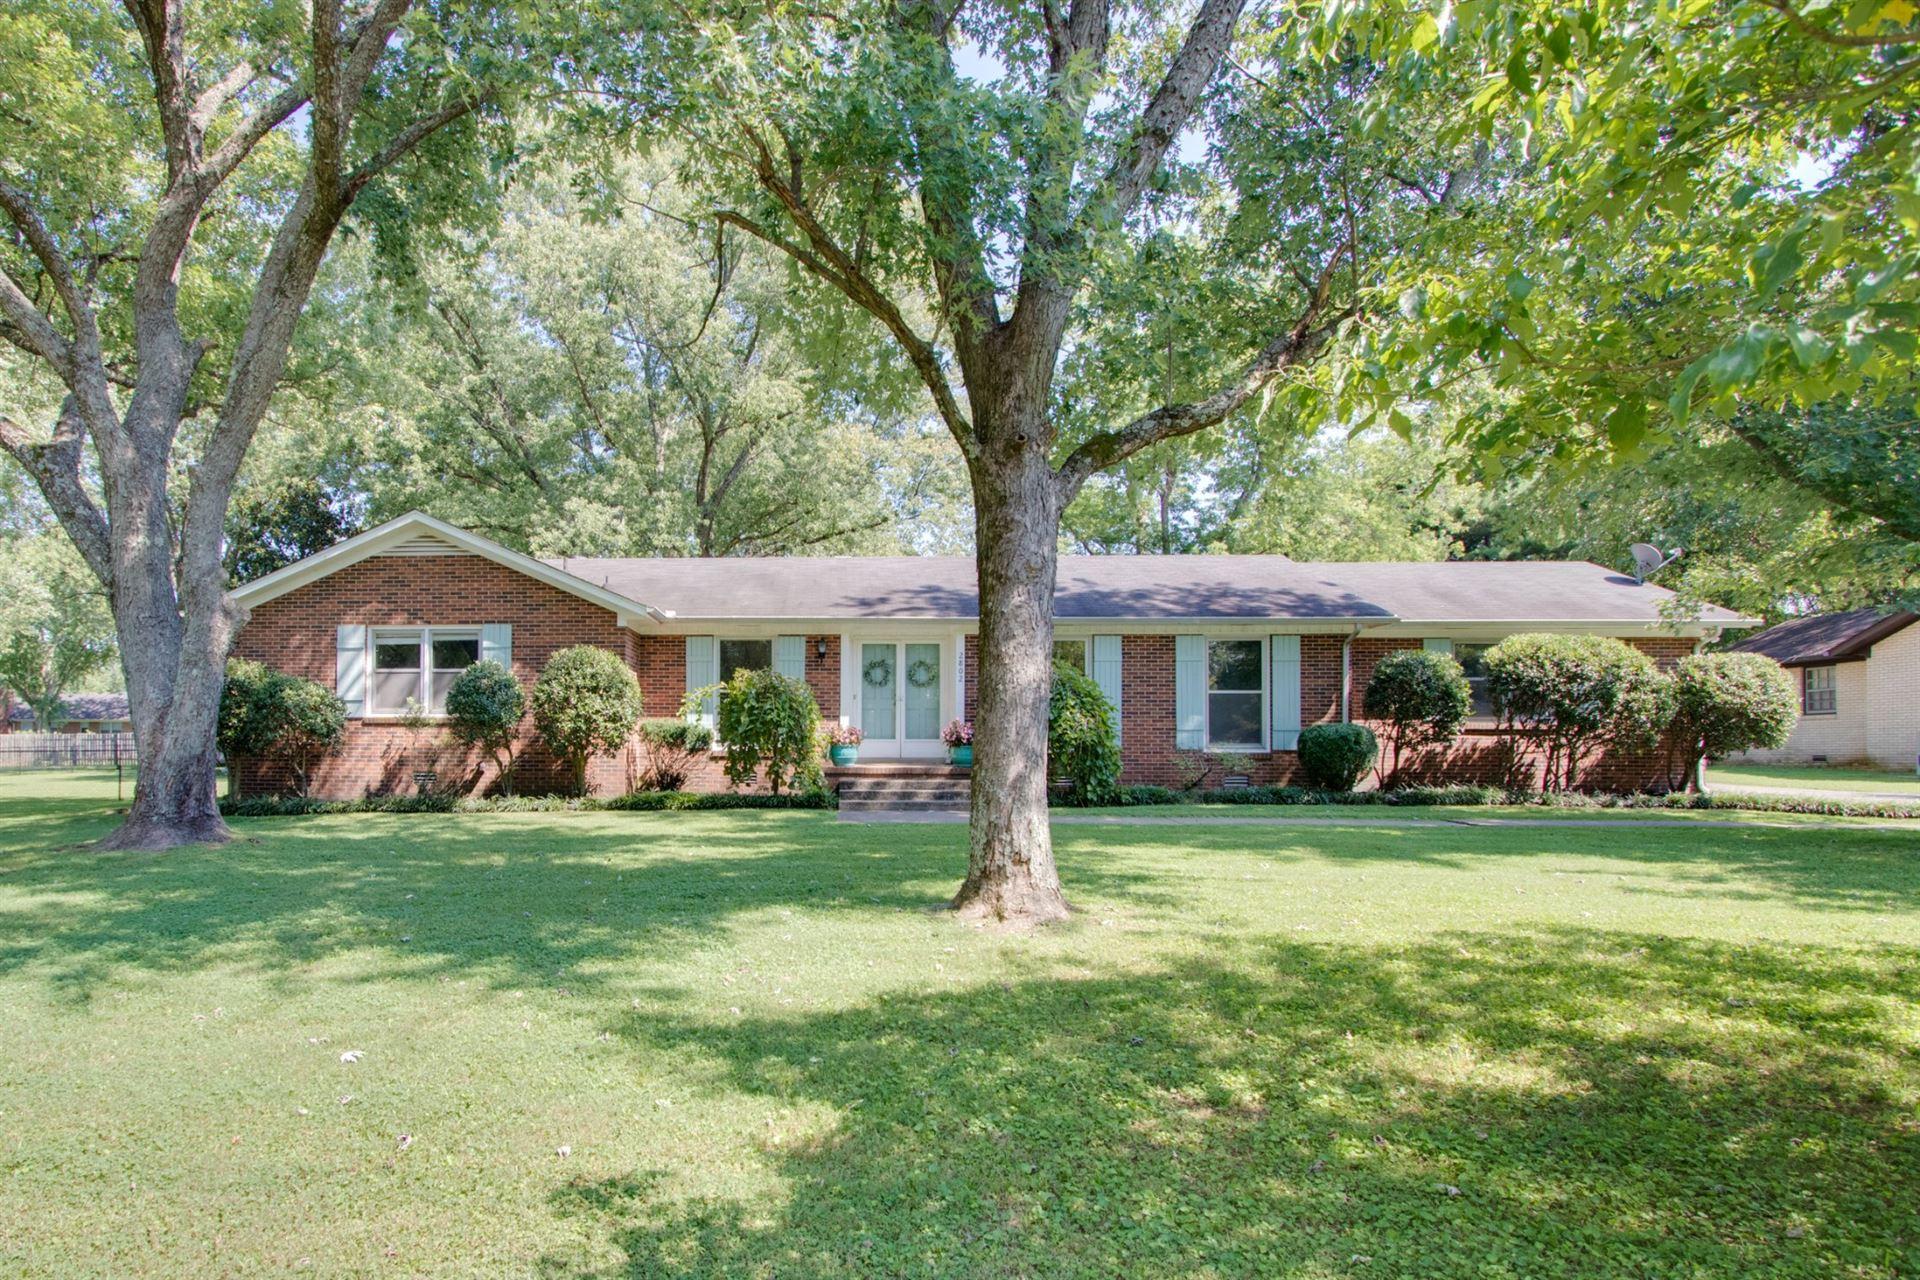 2802 Amber Dr, Murfreesboro, TN 37129 - MLS#: 2187583